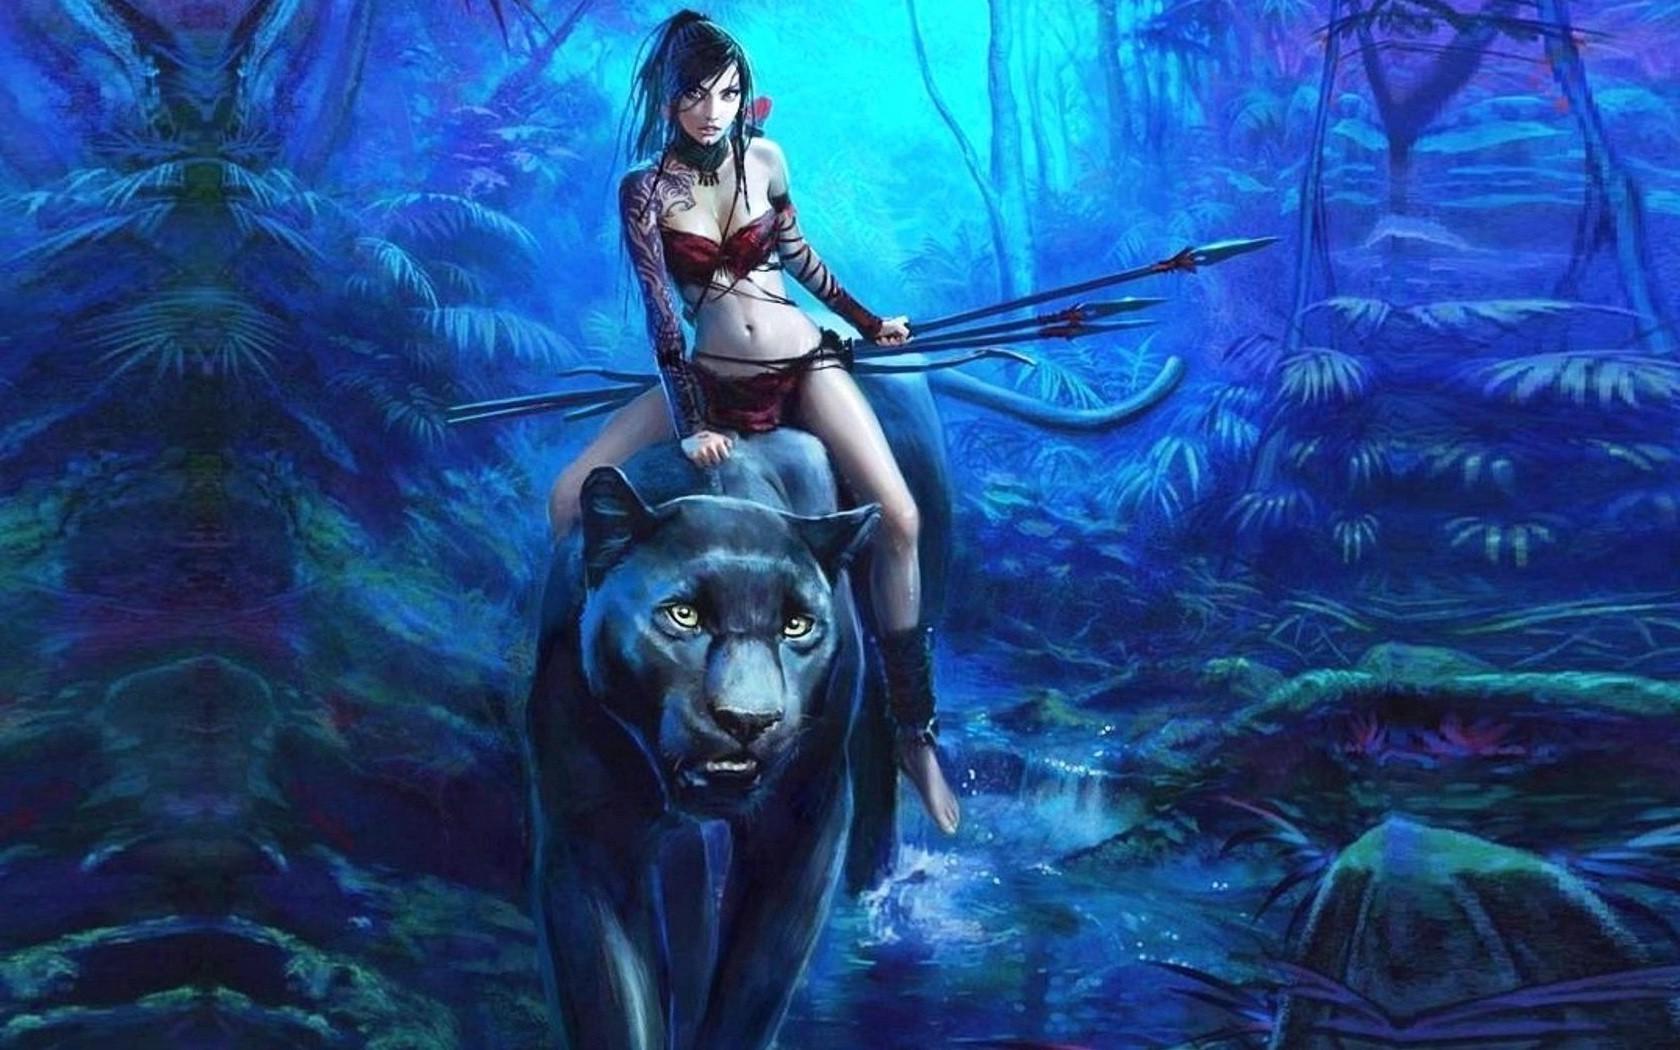 https://get.wallhere.com/photo/1680x1050-px-fantasy-art-1029990.jpg